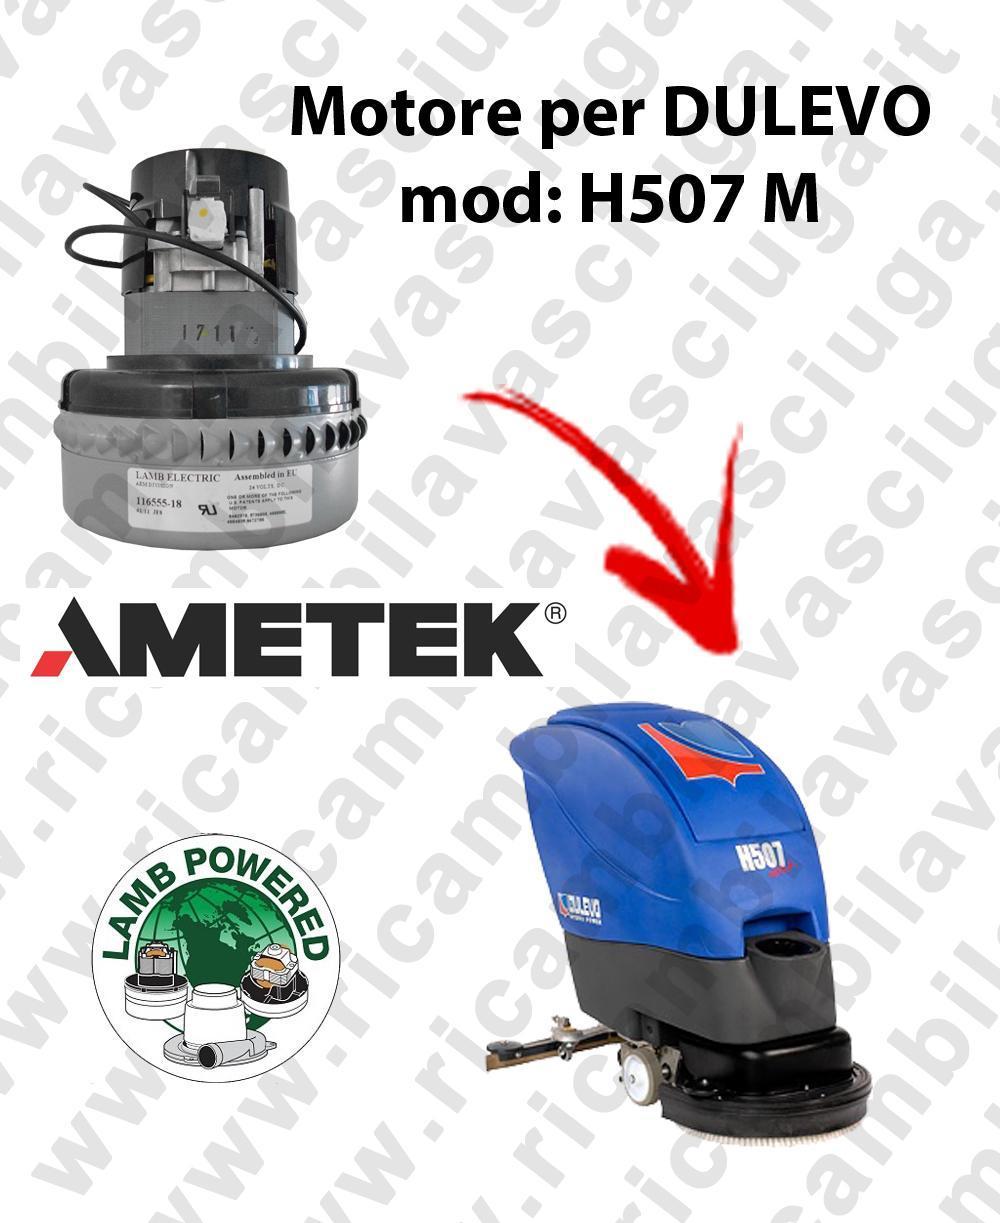 H507 M Motore de aspiración LAMB AMETEK para fregadora DULEVO